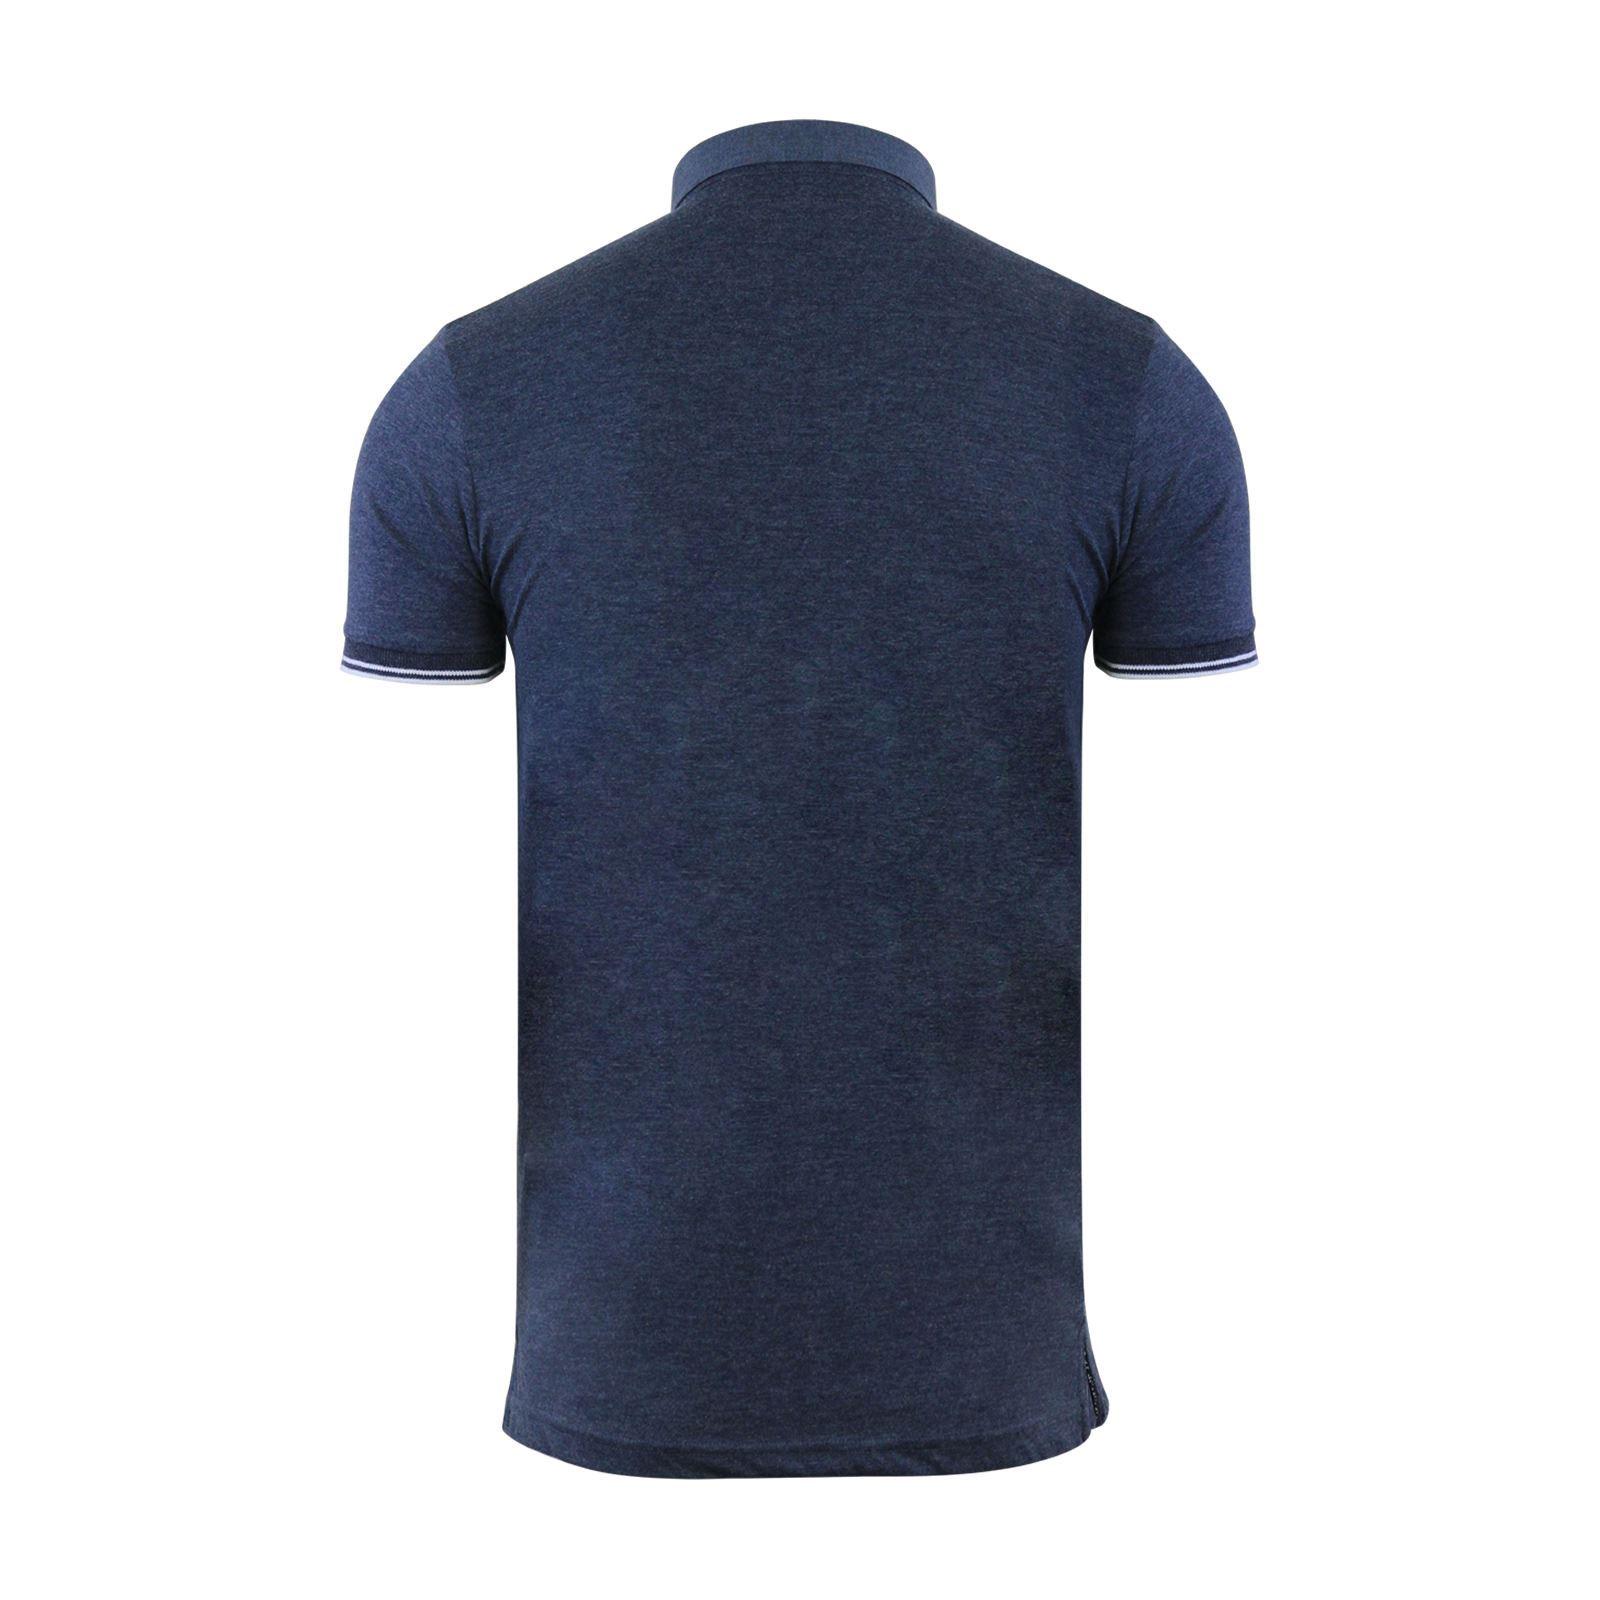 Mens-Polo-T-Shirt-Brave-Soul-Aqua-Printed-Short-Sleeve-Chambray-Collar-Top thumbnail 3